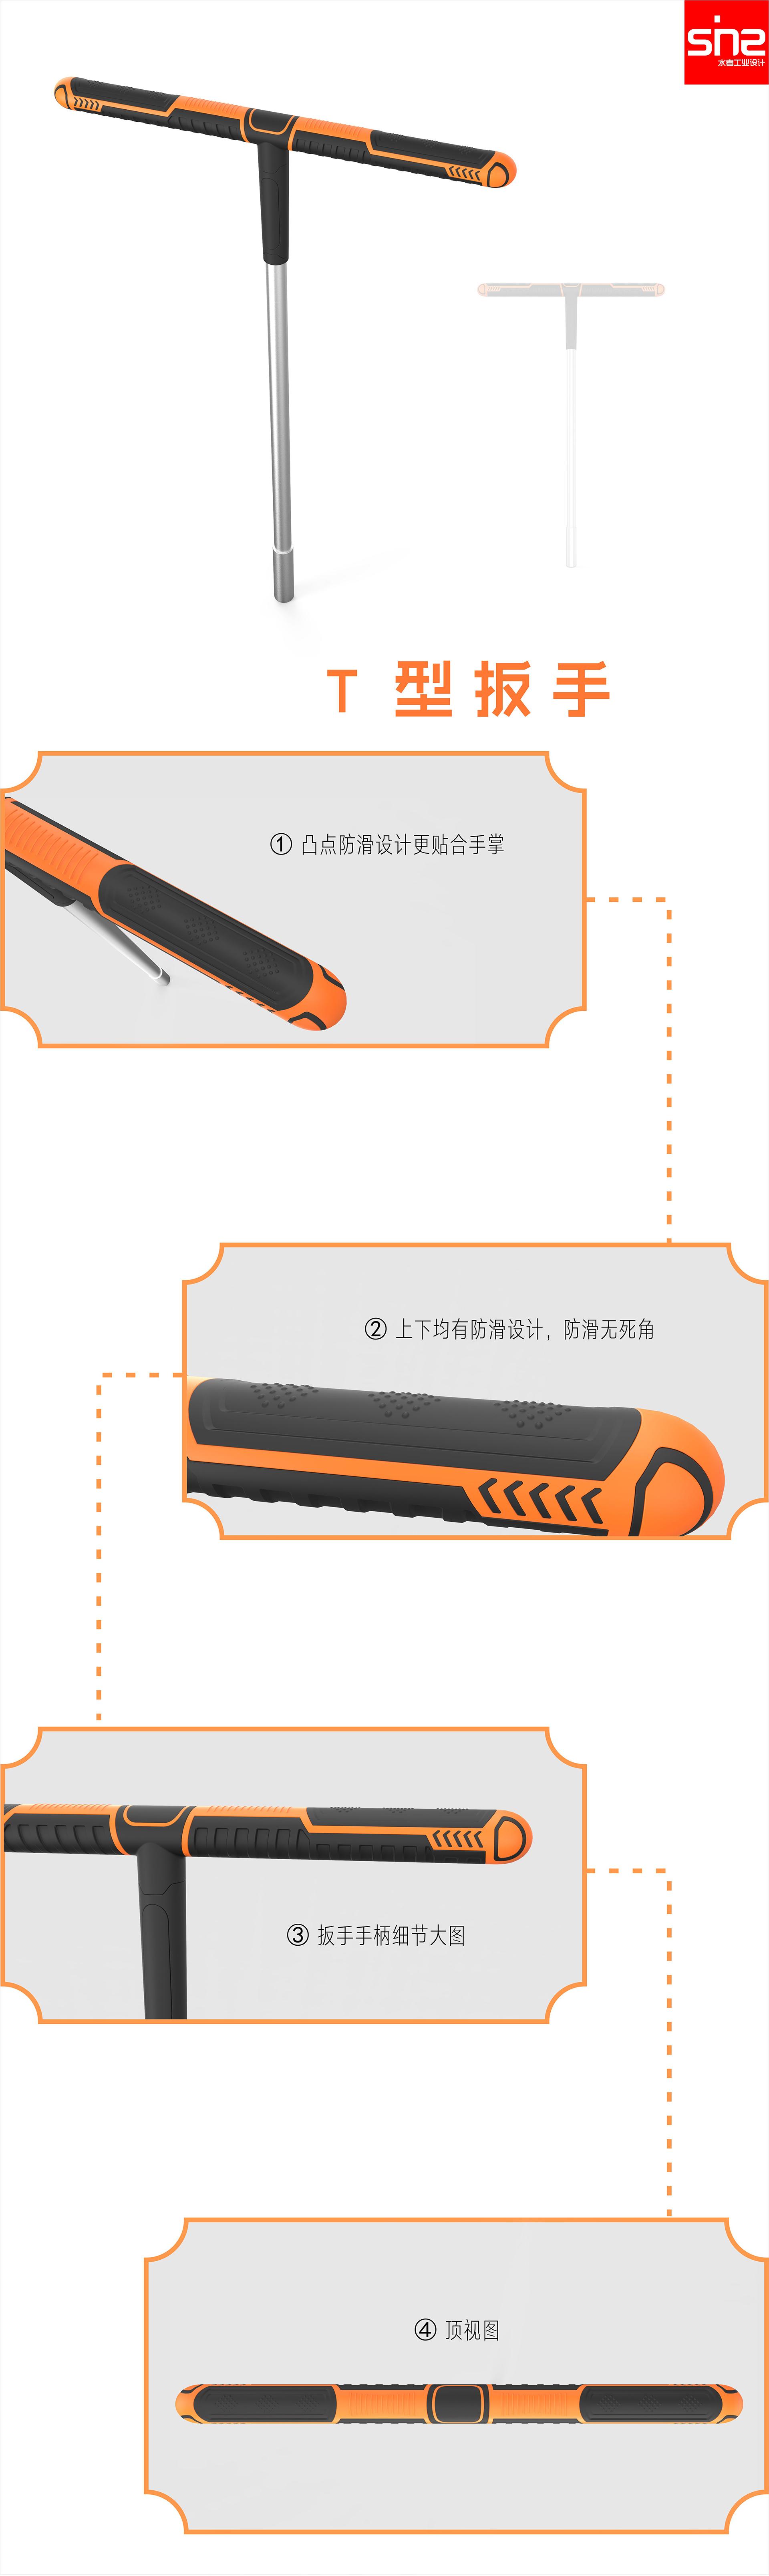 3T形扳手工业设计1.jpg